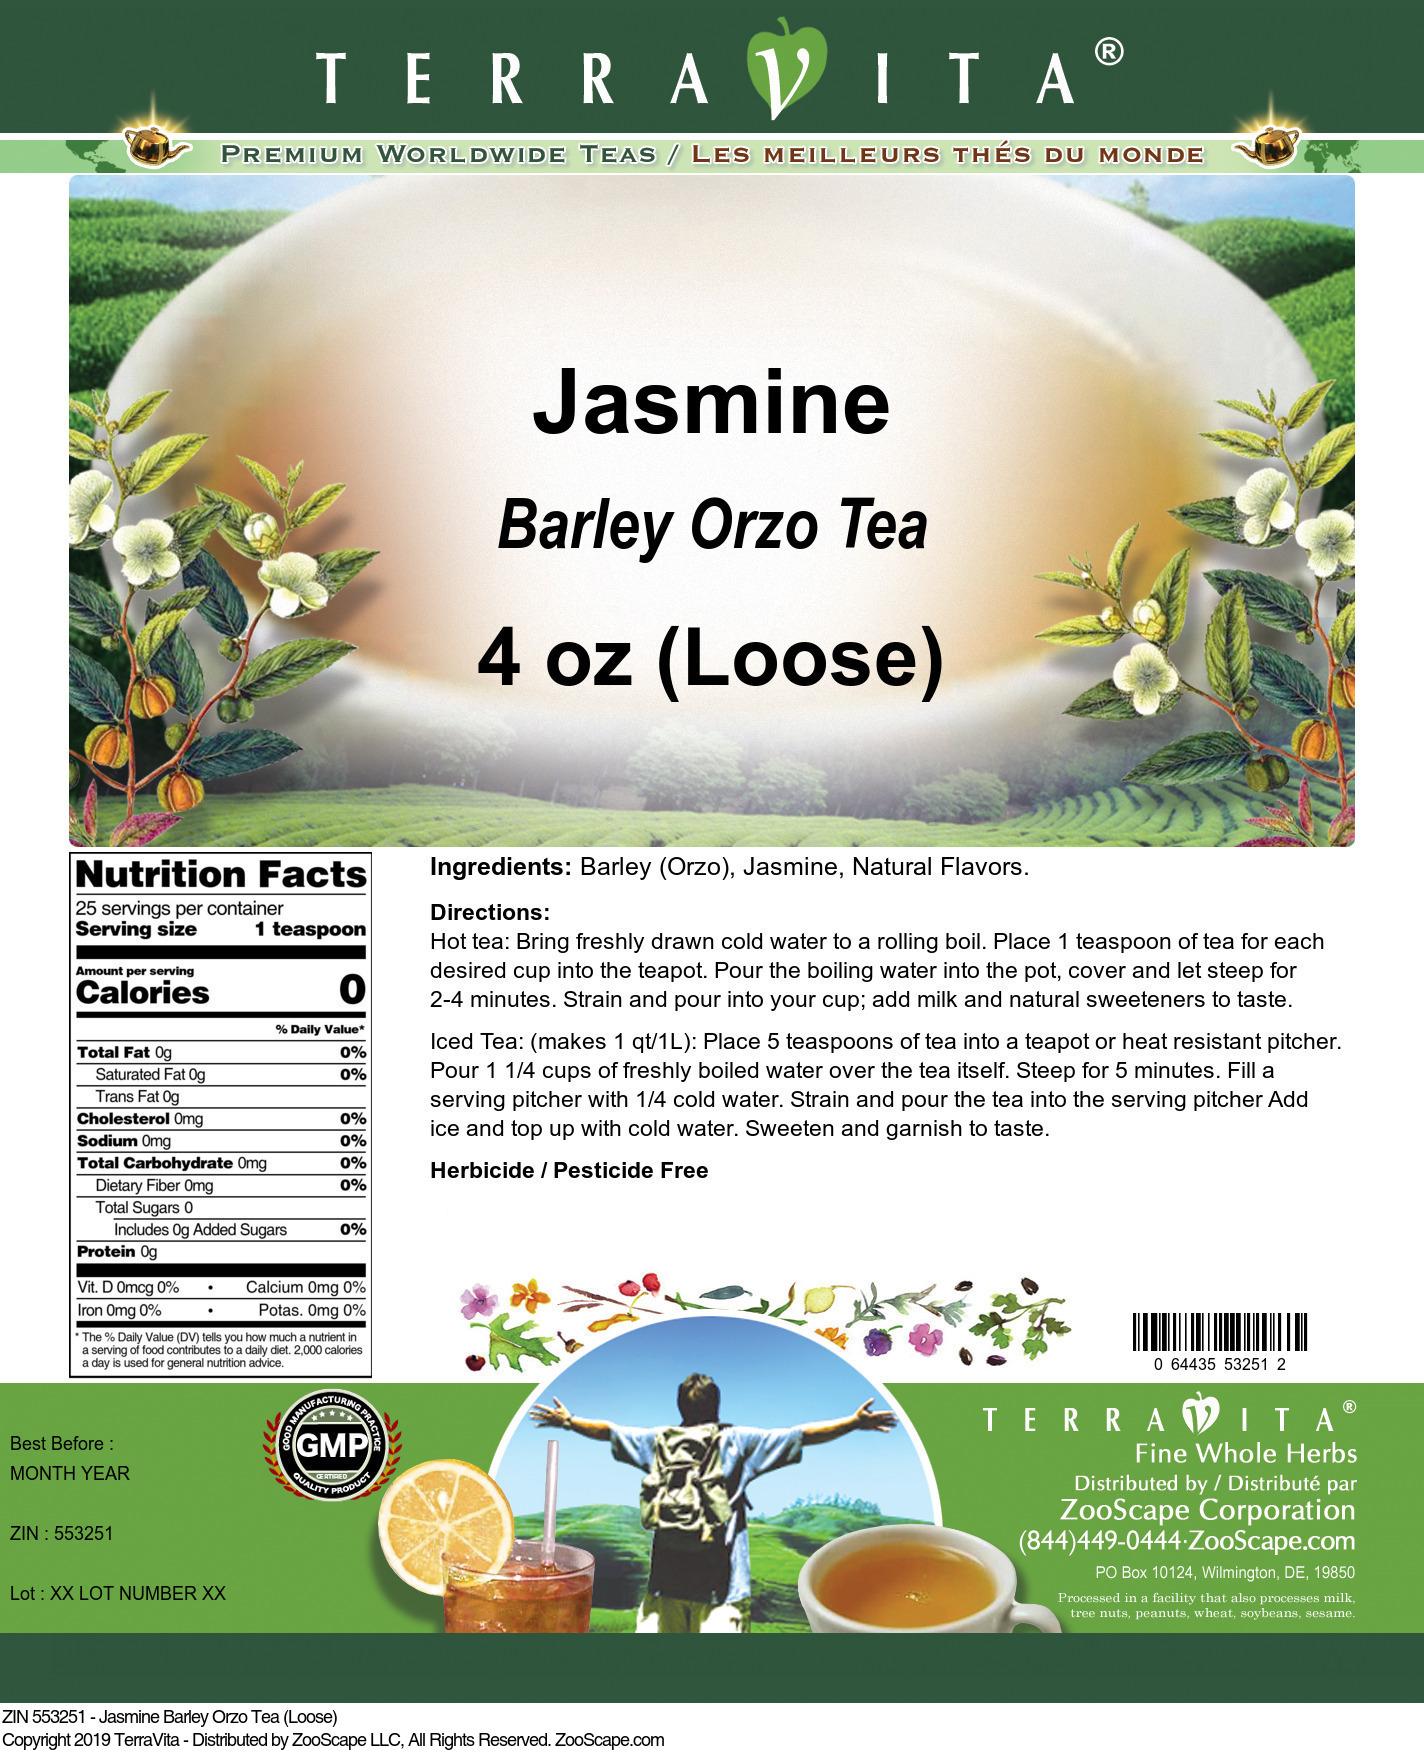 Jasmine Barley Orzo